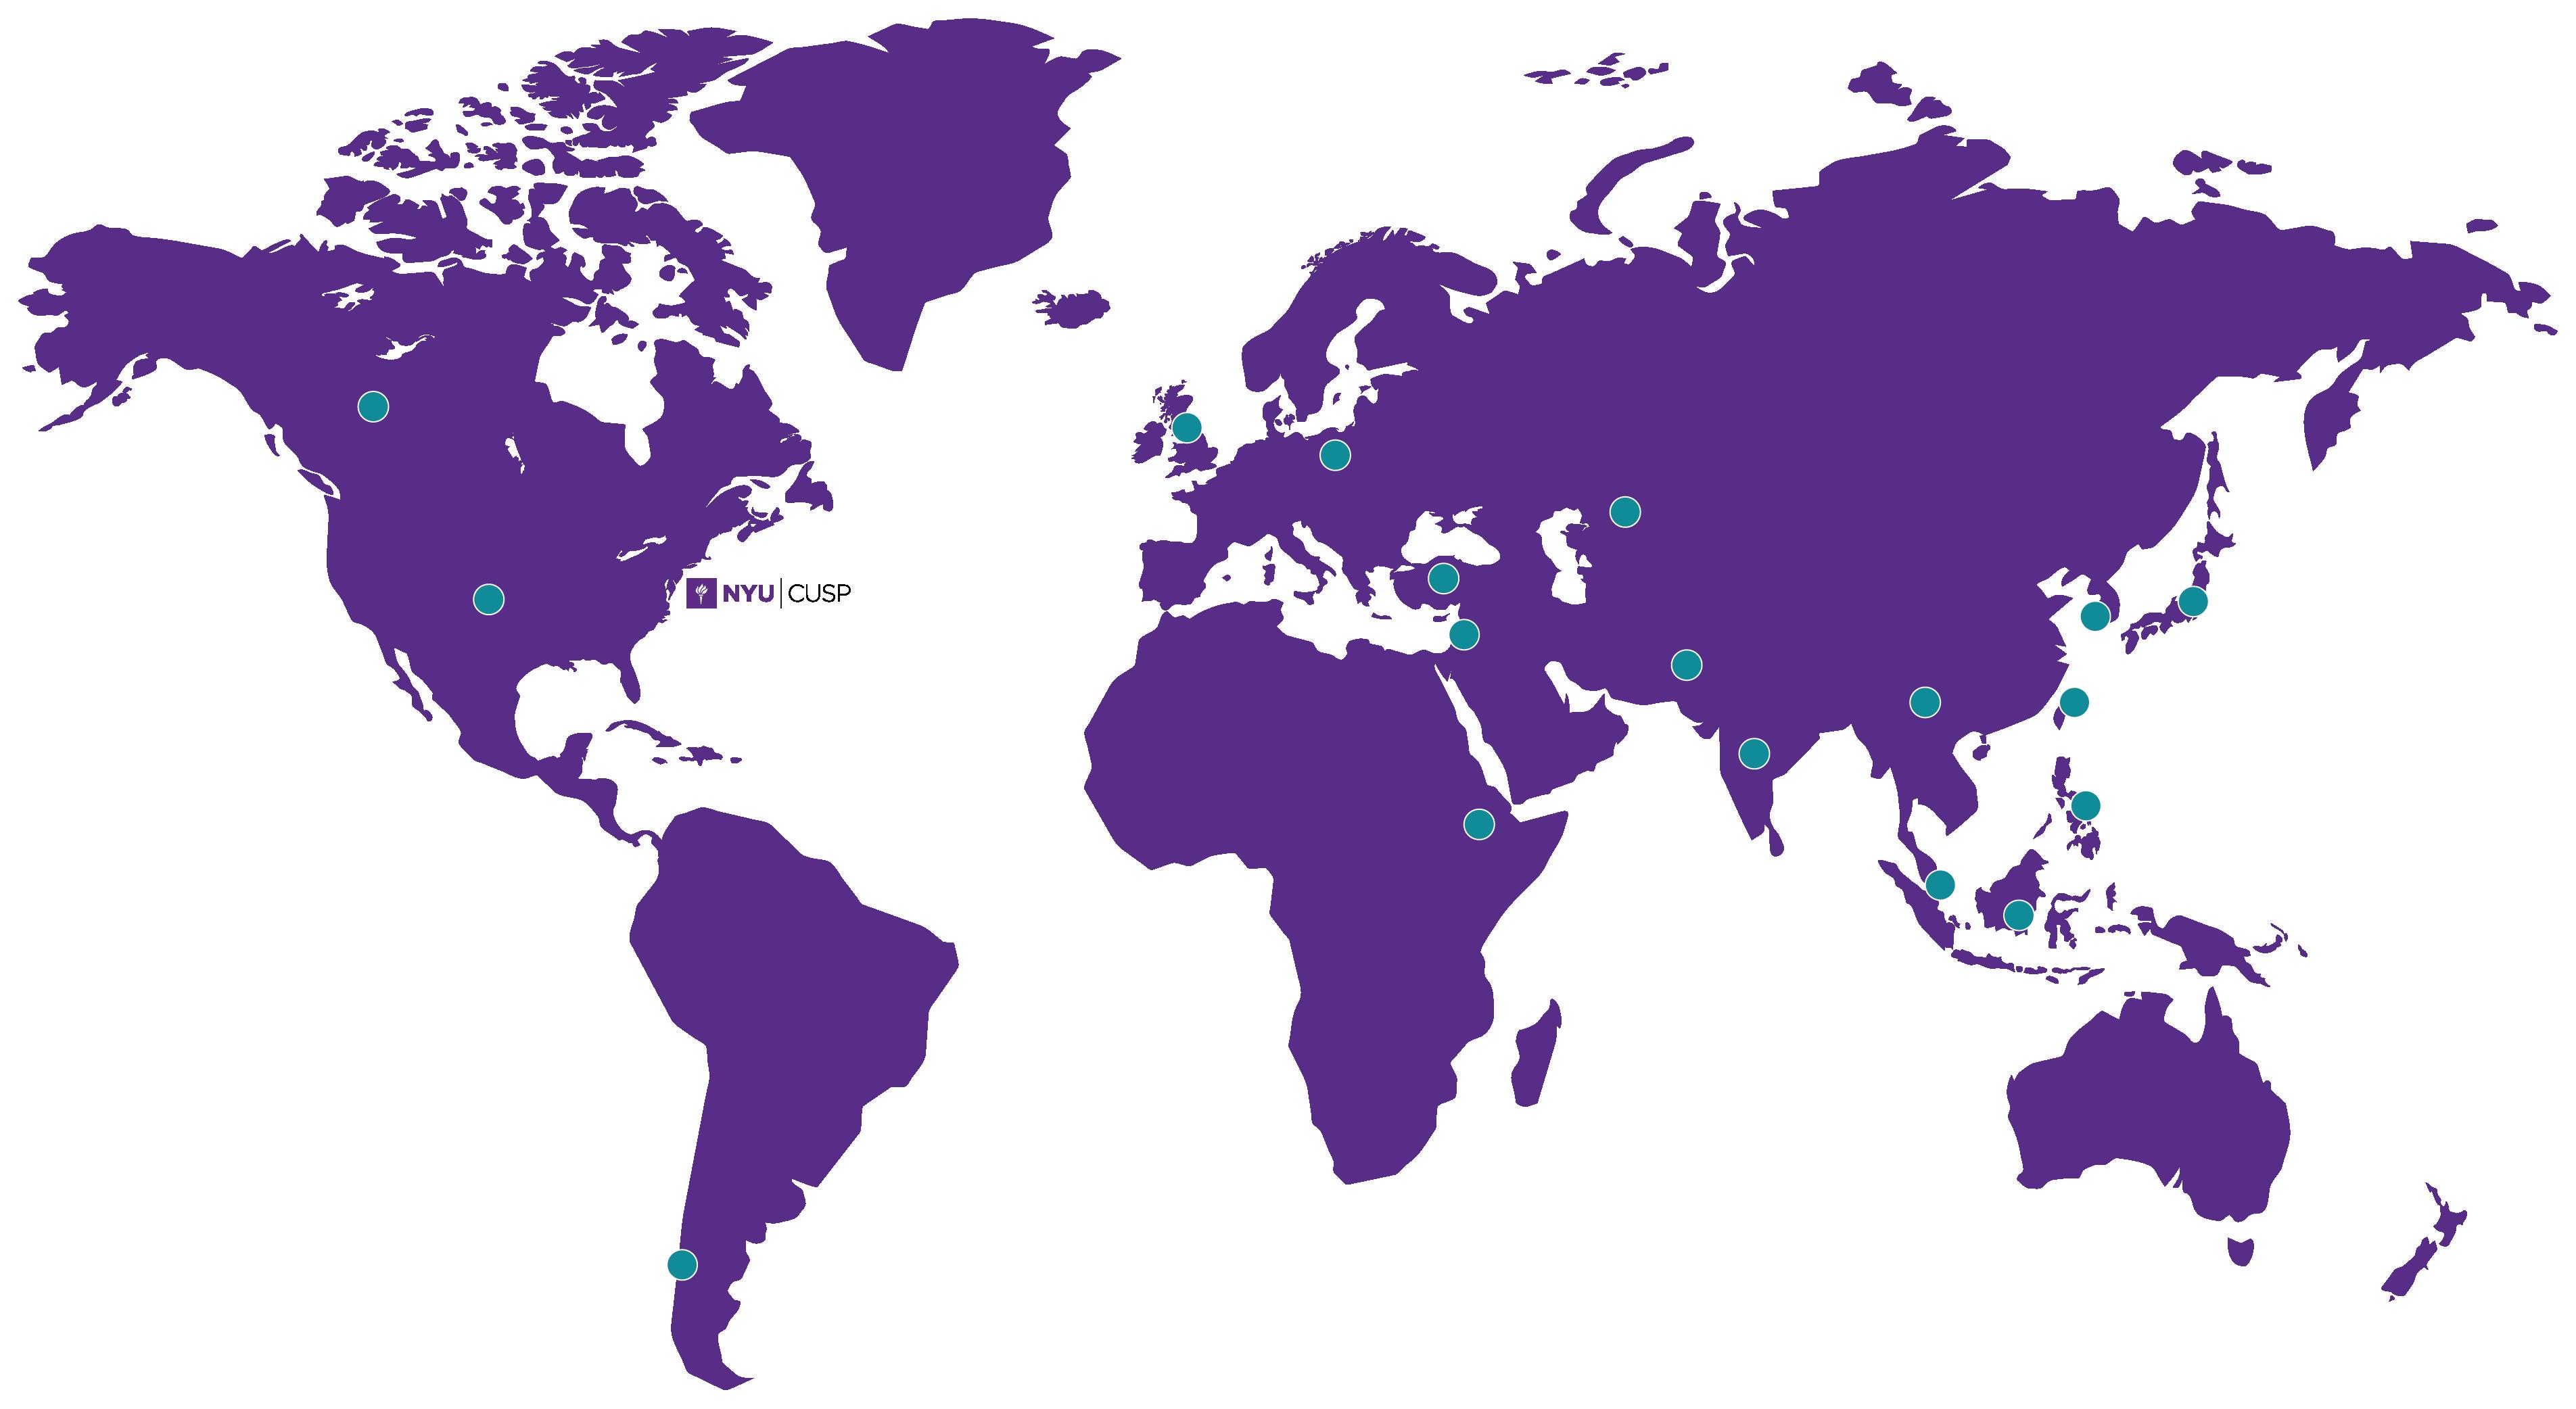 World map of NYU CUSP students